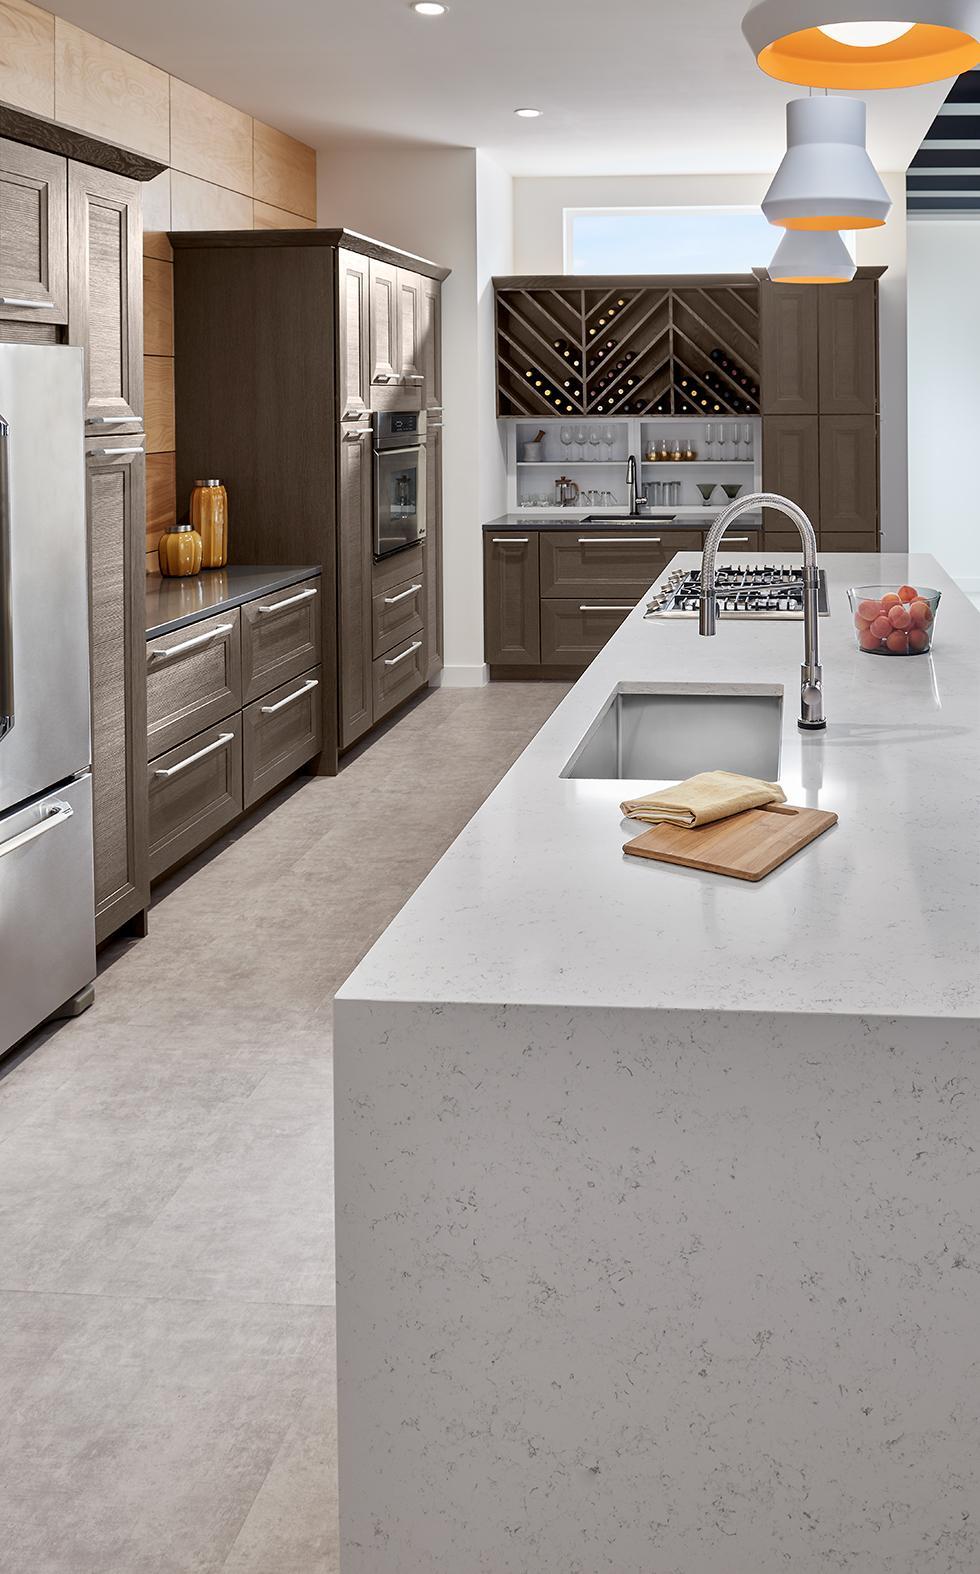 Contemporary Loft Kitchen with Quartz Countertop